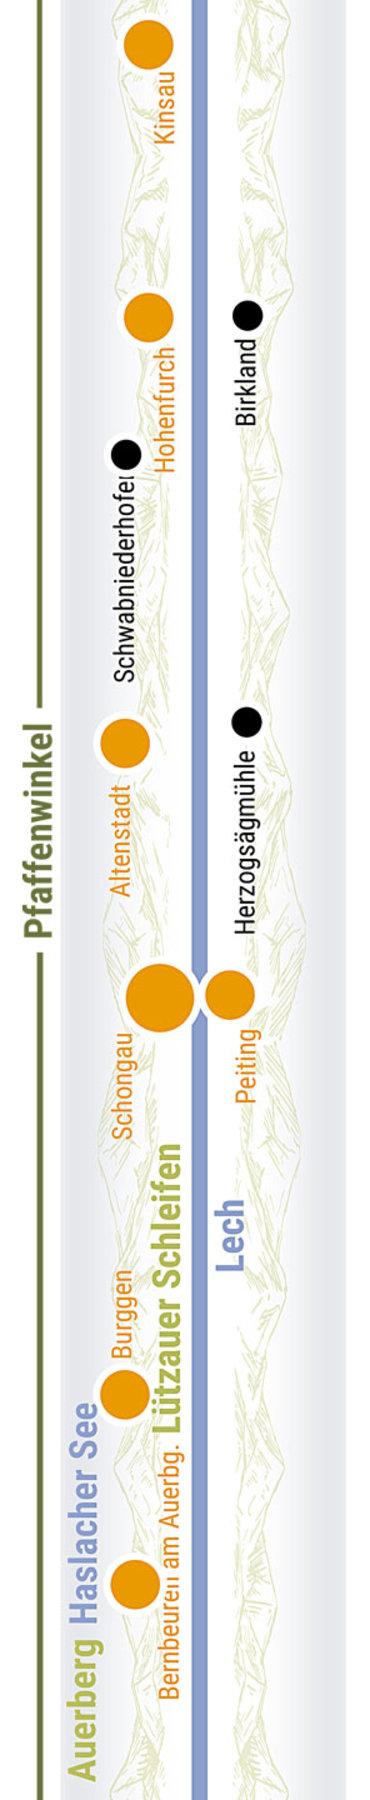 Übersichtskarte rechts Teilabschnitt 07 Schongau Peitingen